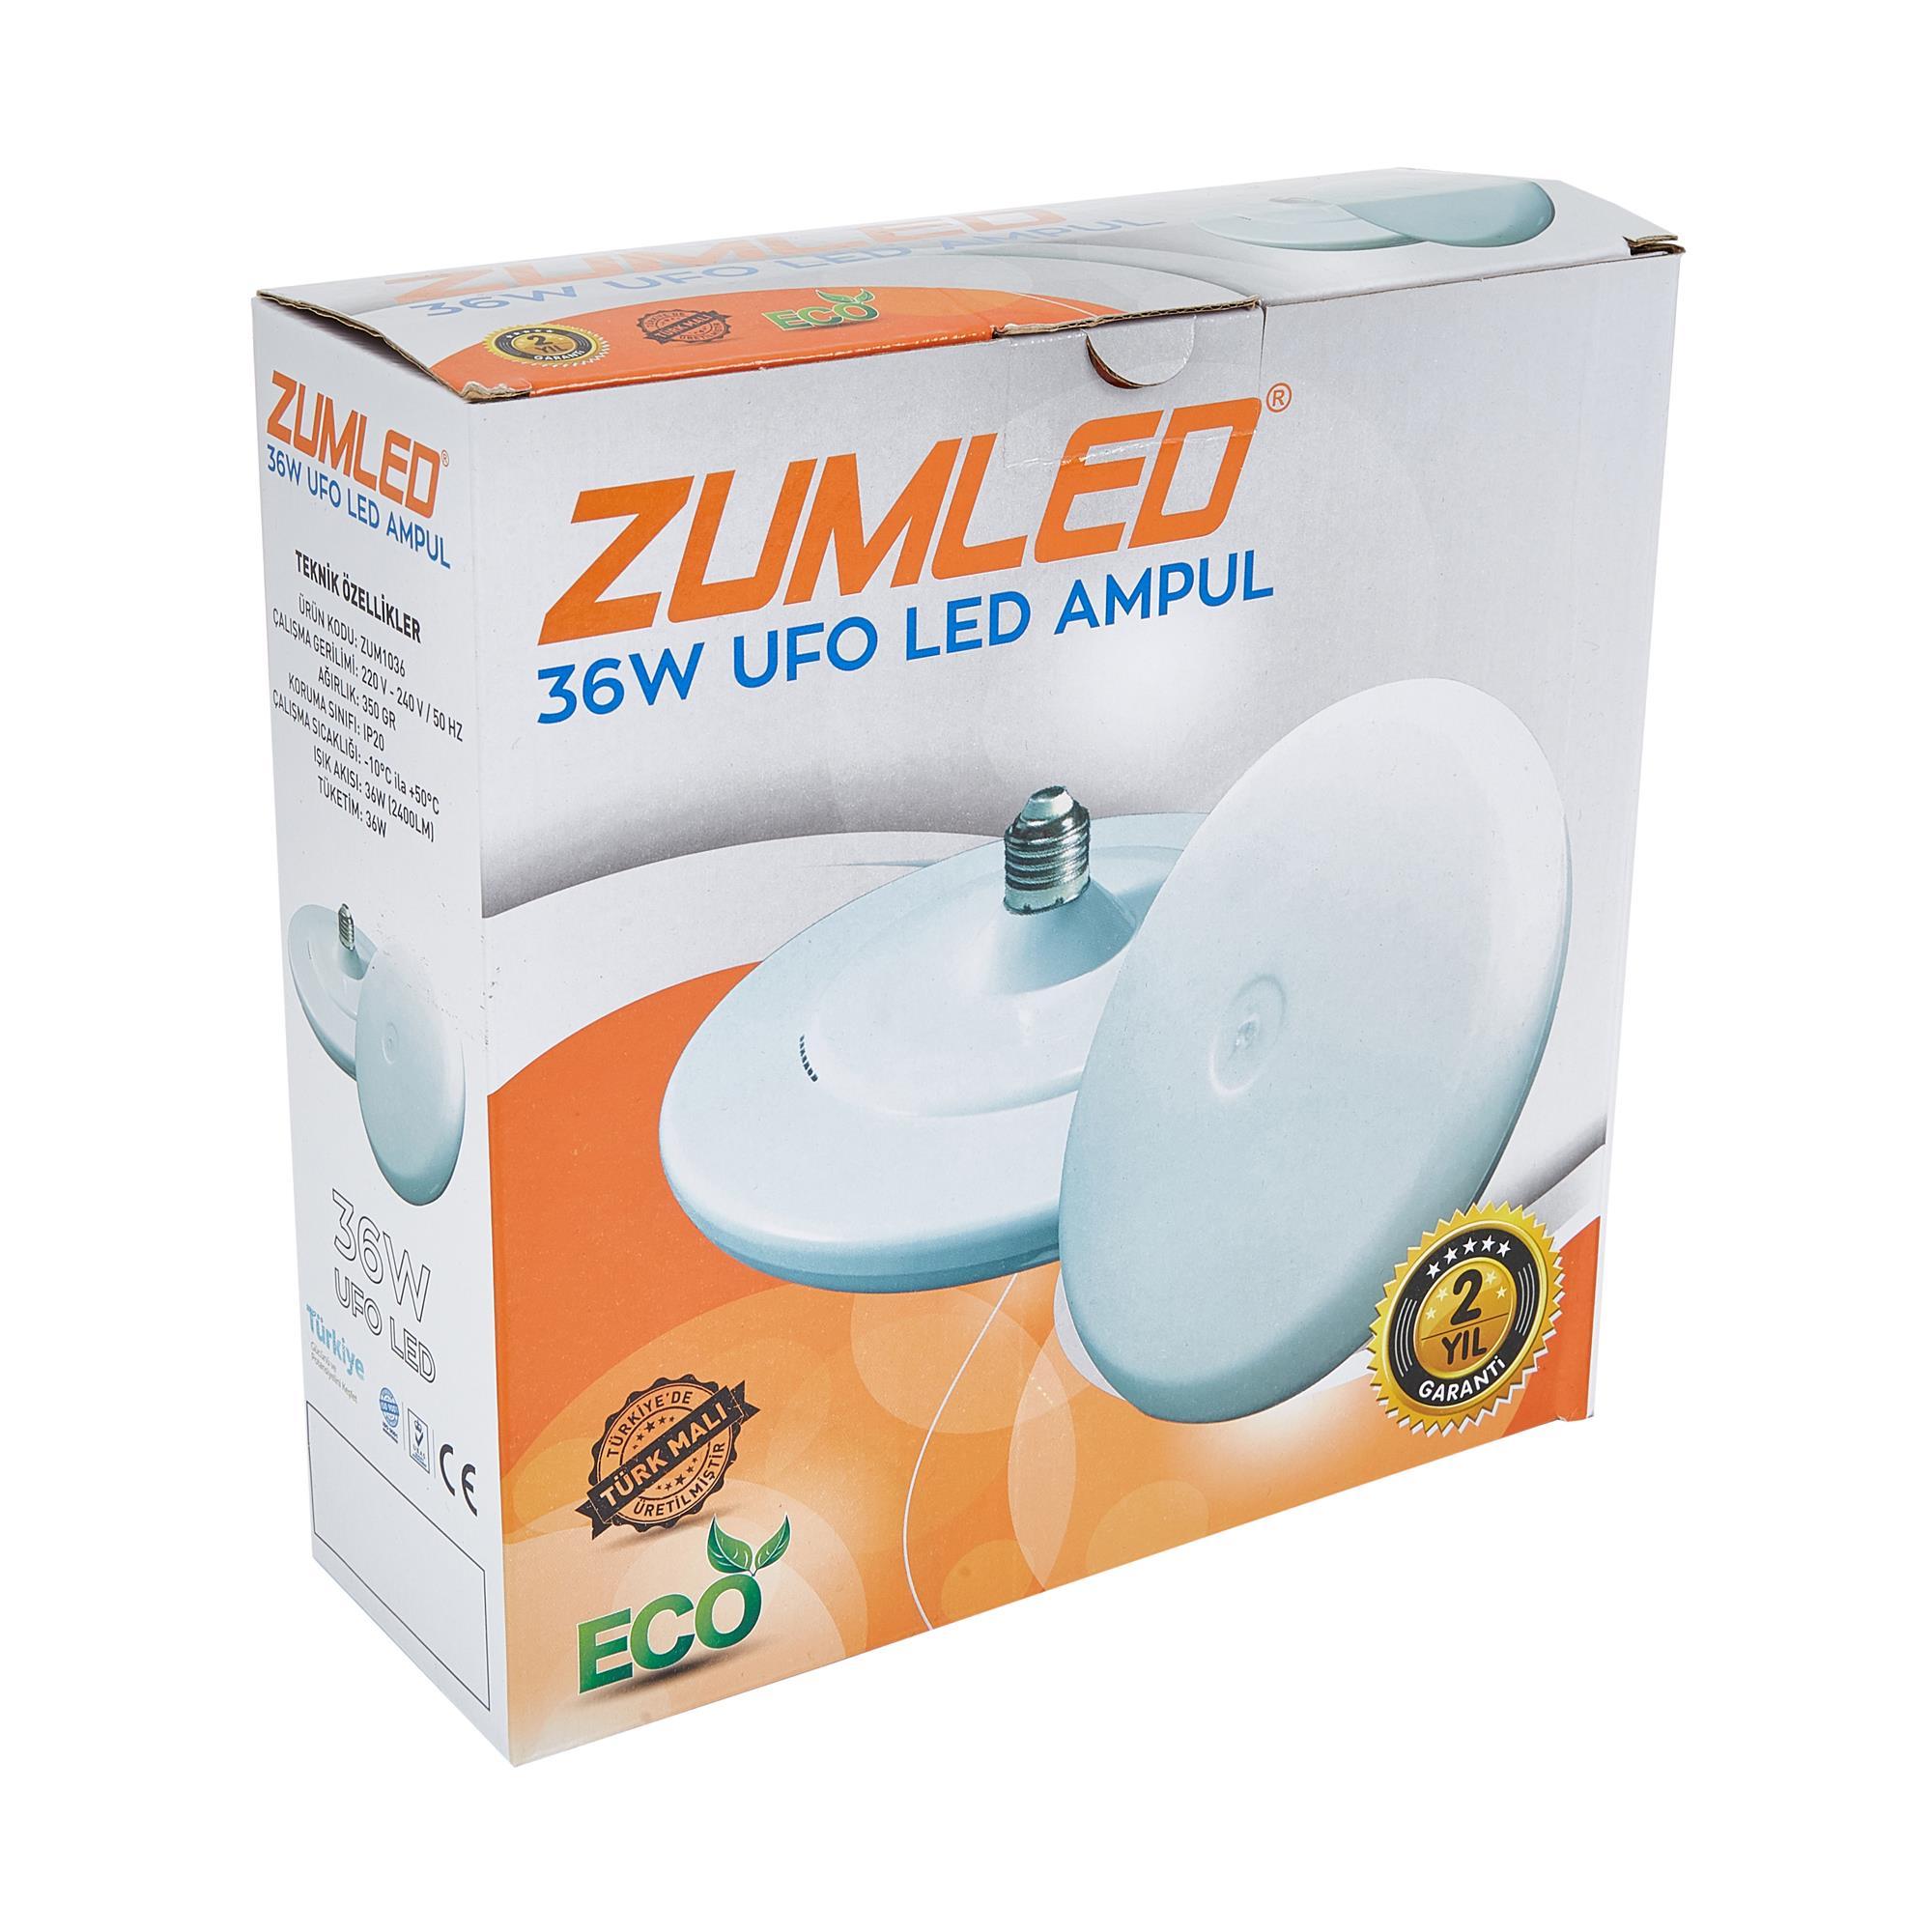 ZUMLED ZUM-TR 36W UFO LED AMPUL